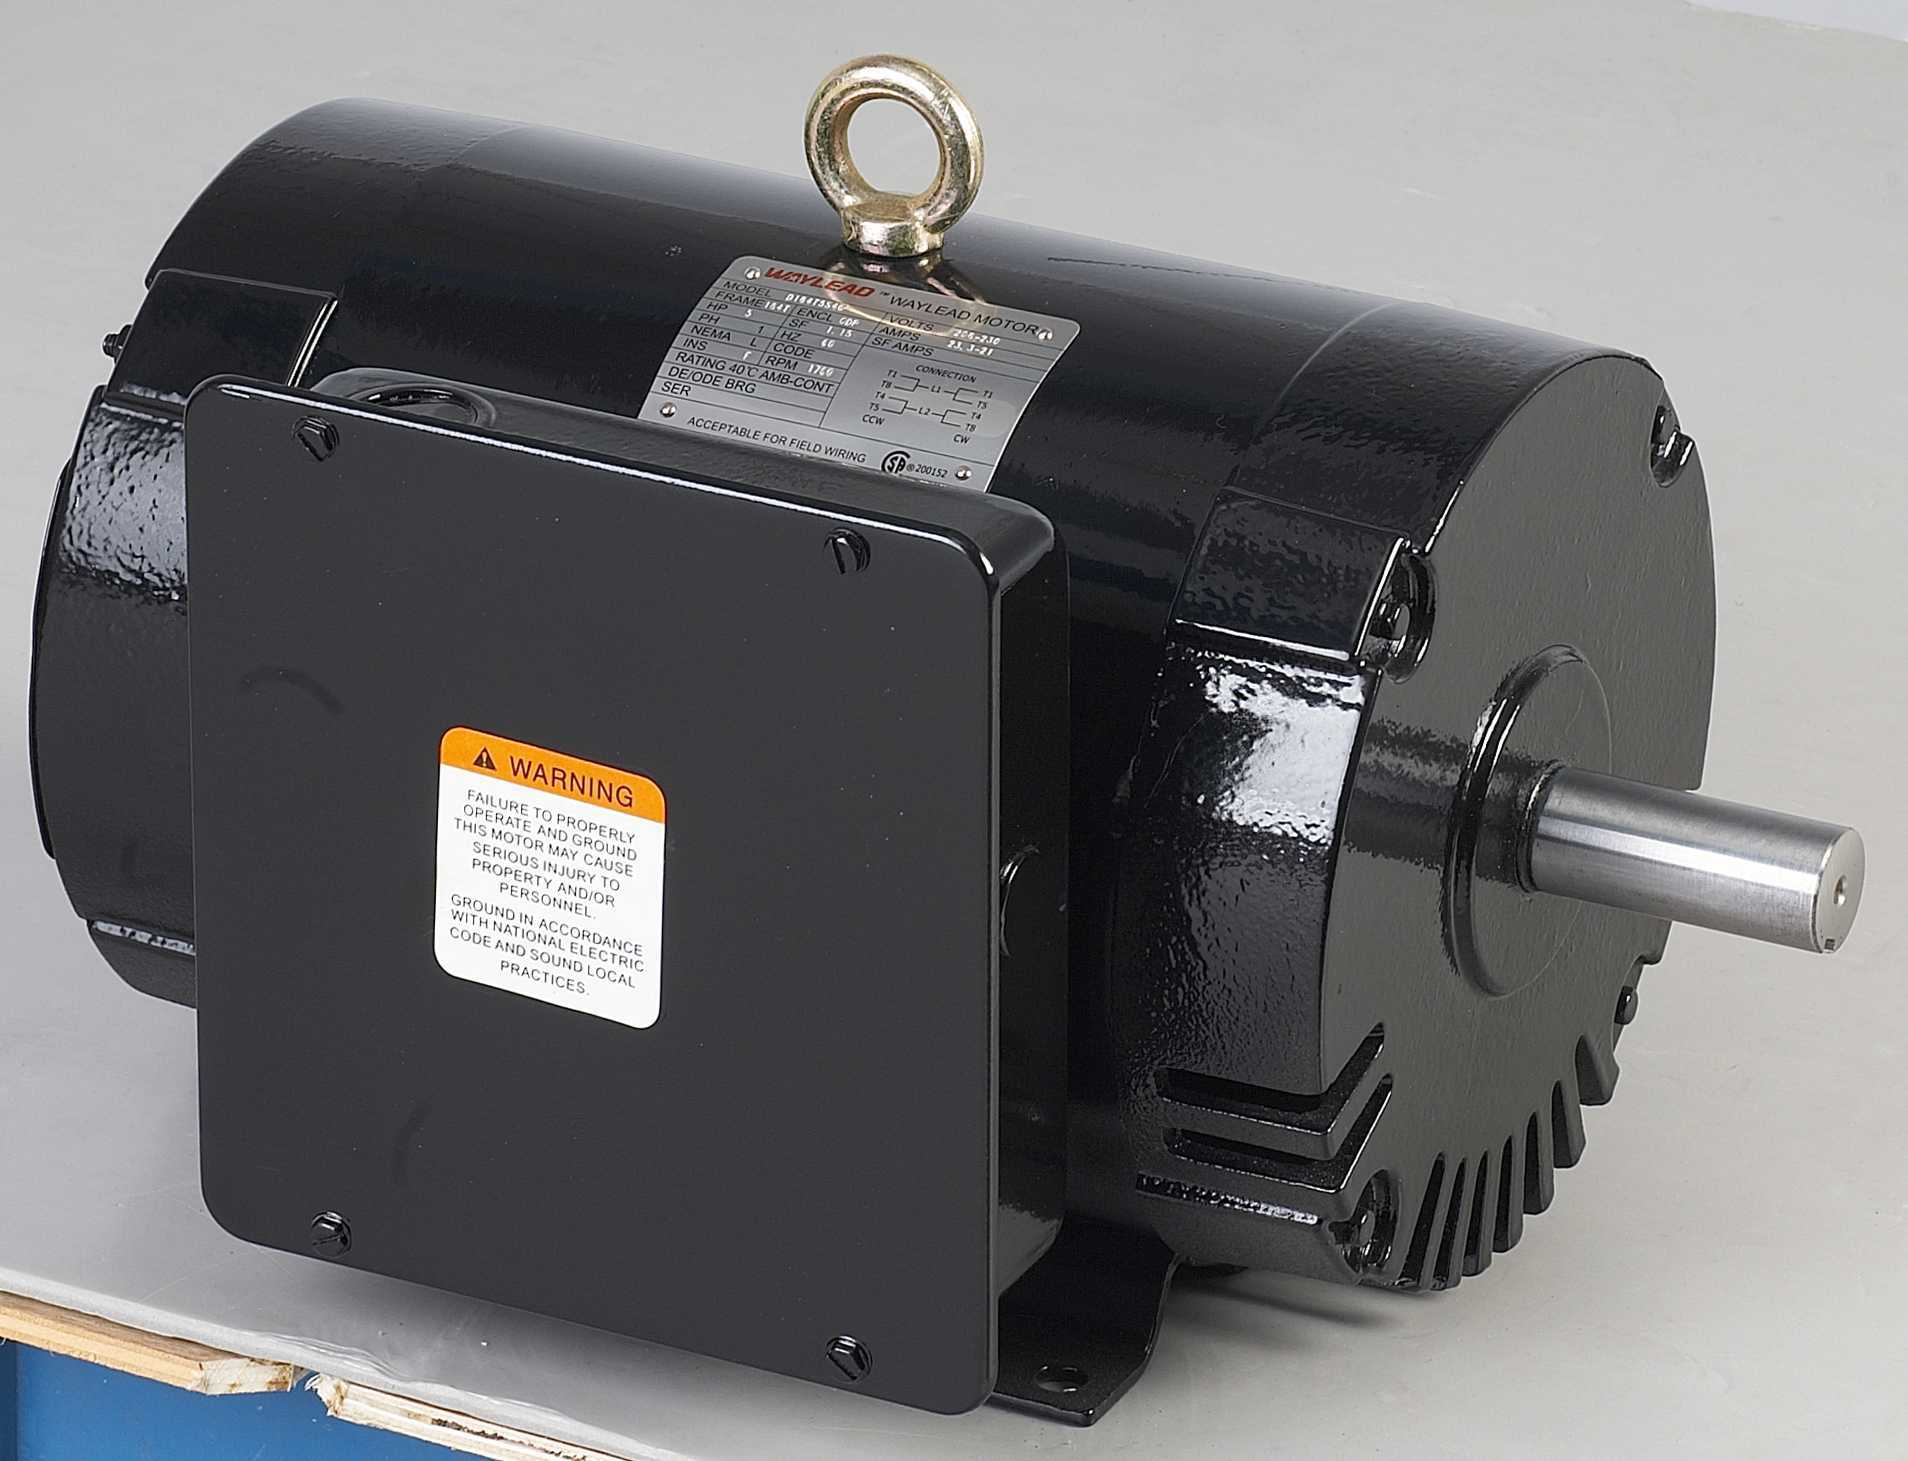 Single Phase Compressor : China odp single phase air compressor nema motor photos